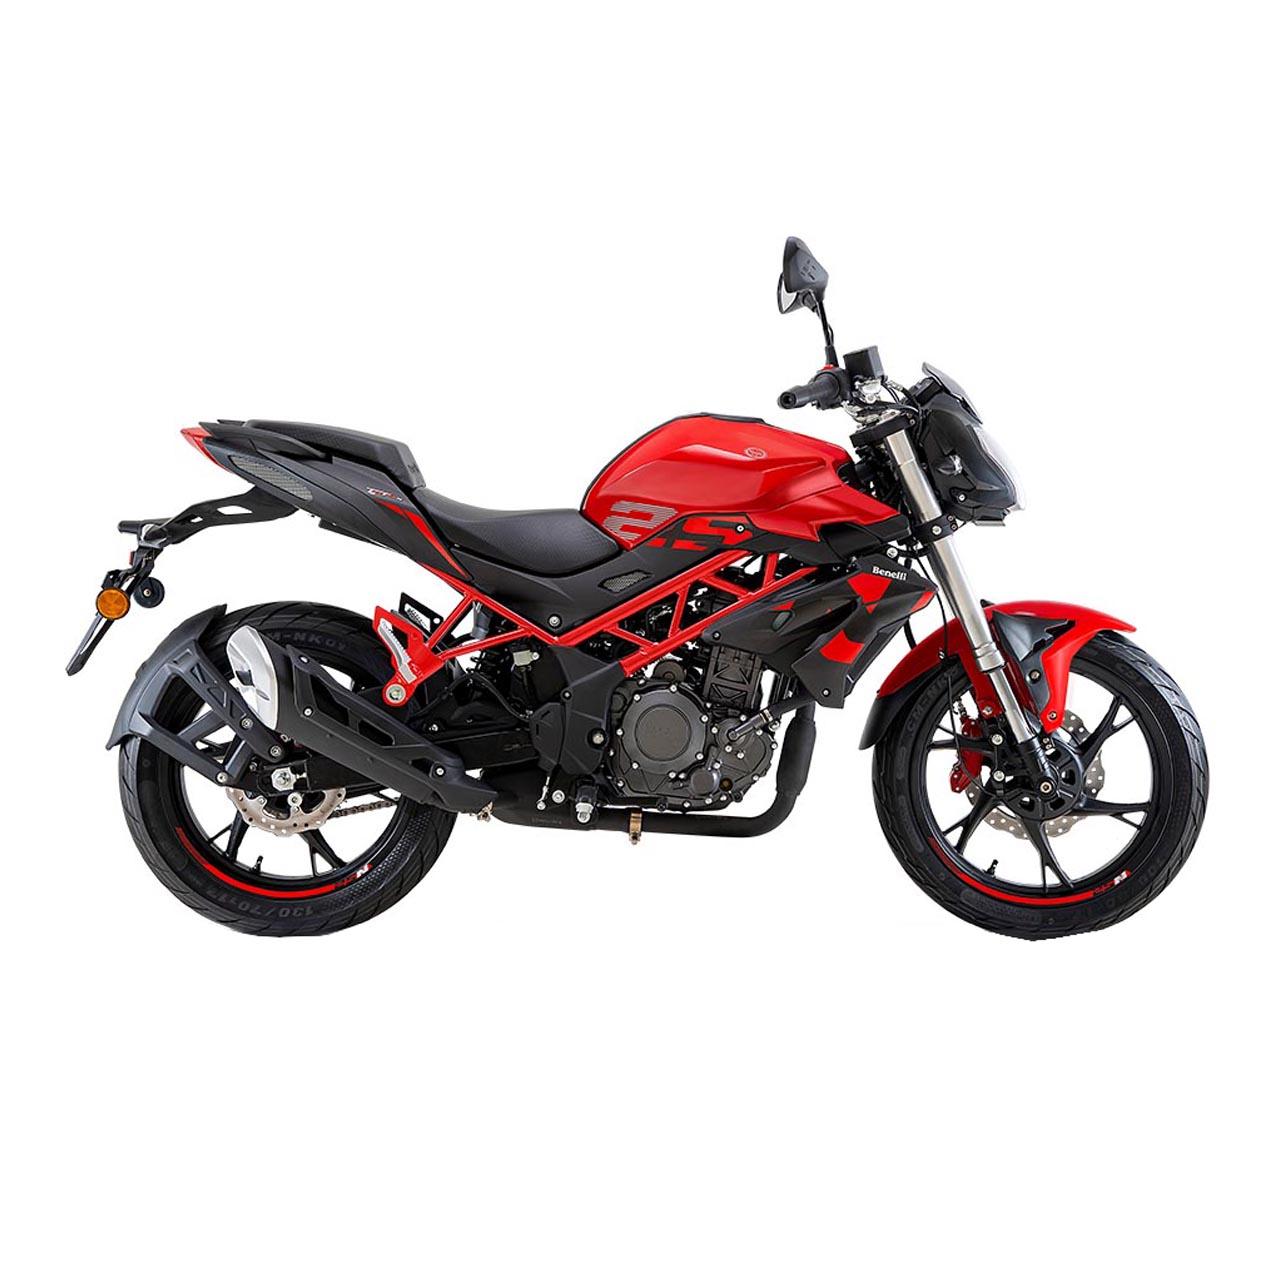 موتورسیکلت بنلی مدل TNT25N سال 1399